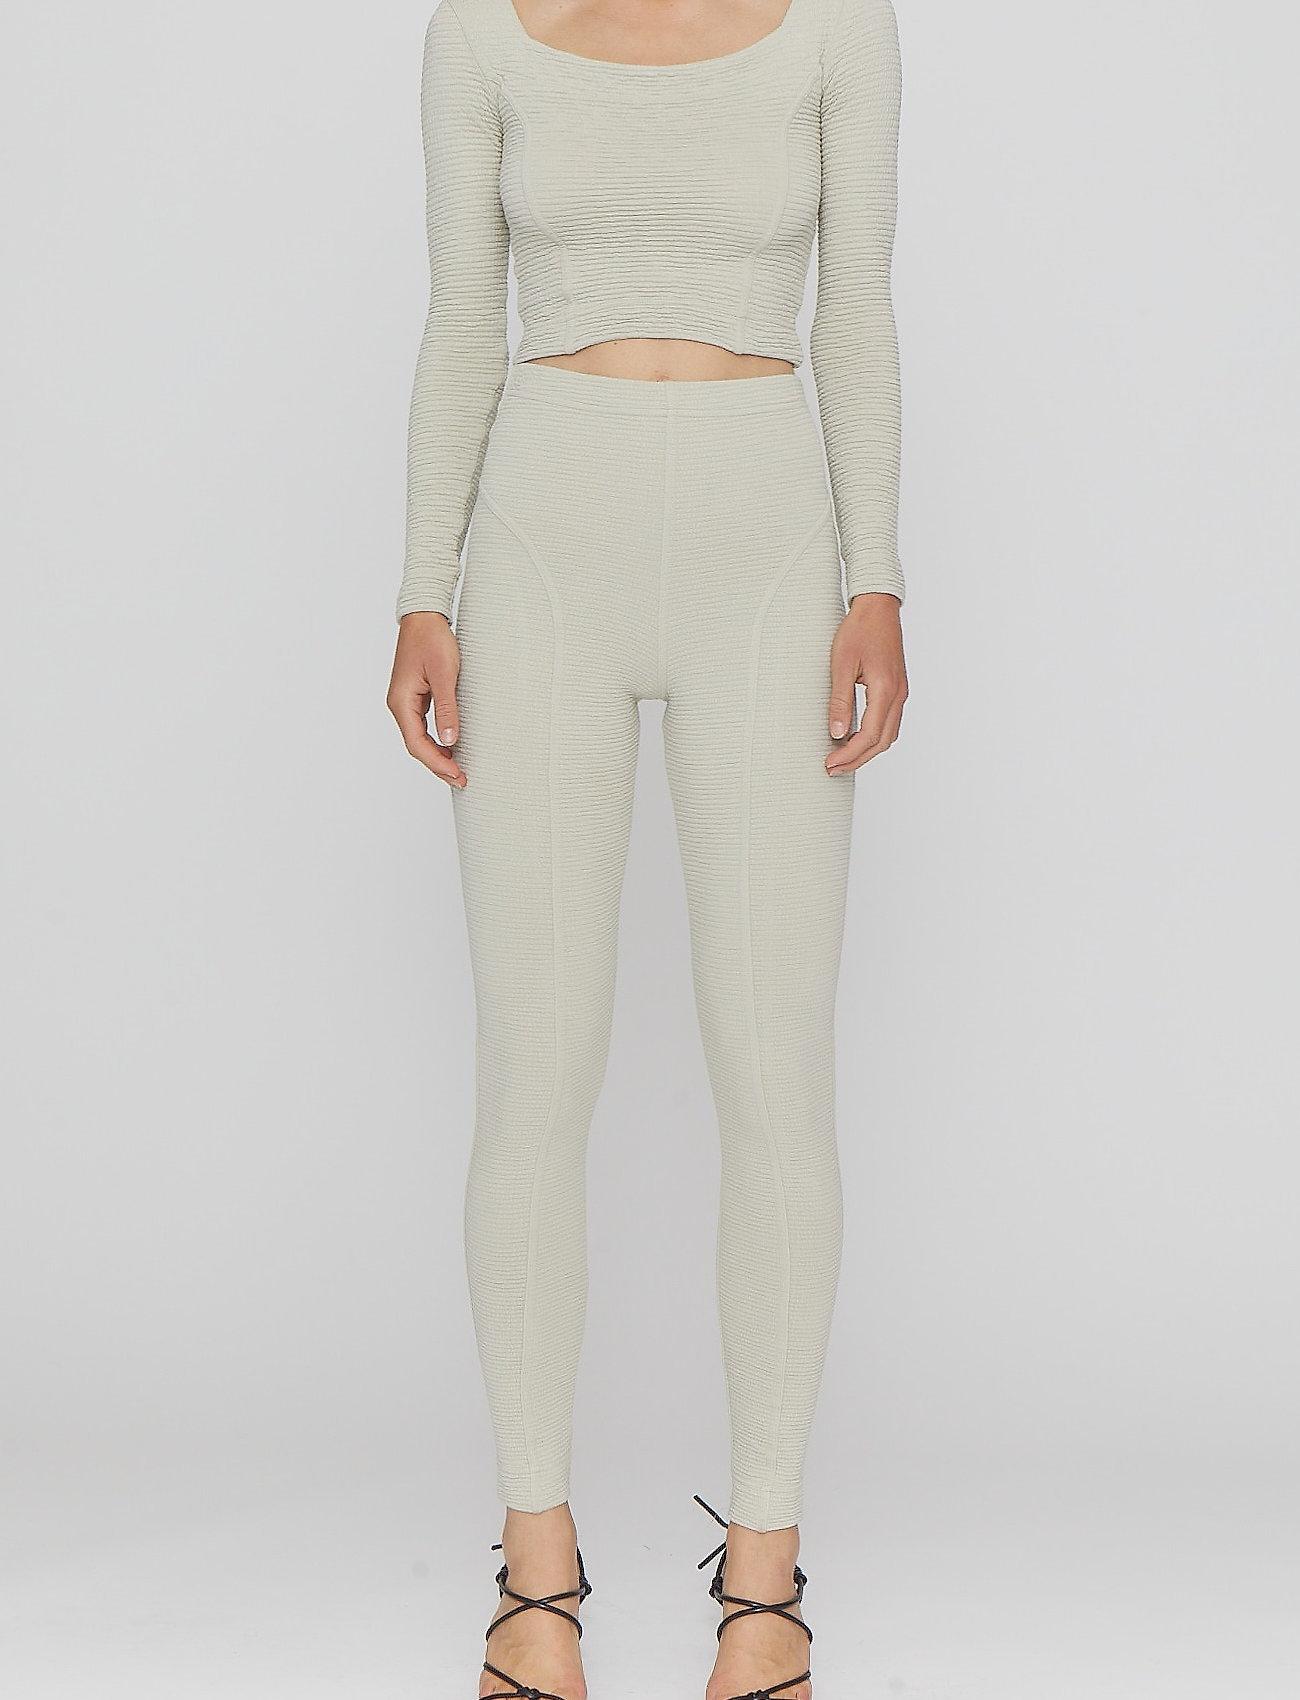 REMAIN Birger Christensen - Marisa Tights - leggings - pelican - 0